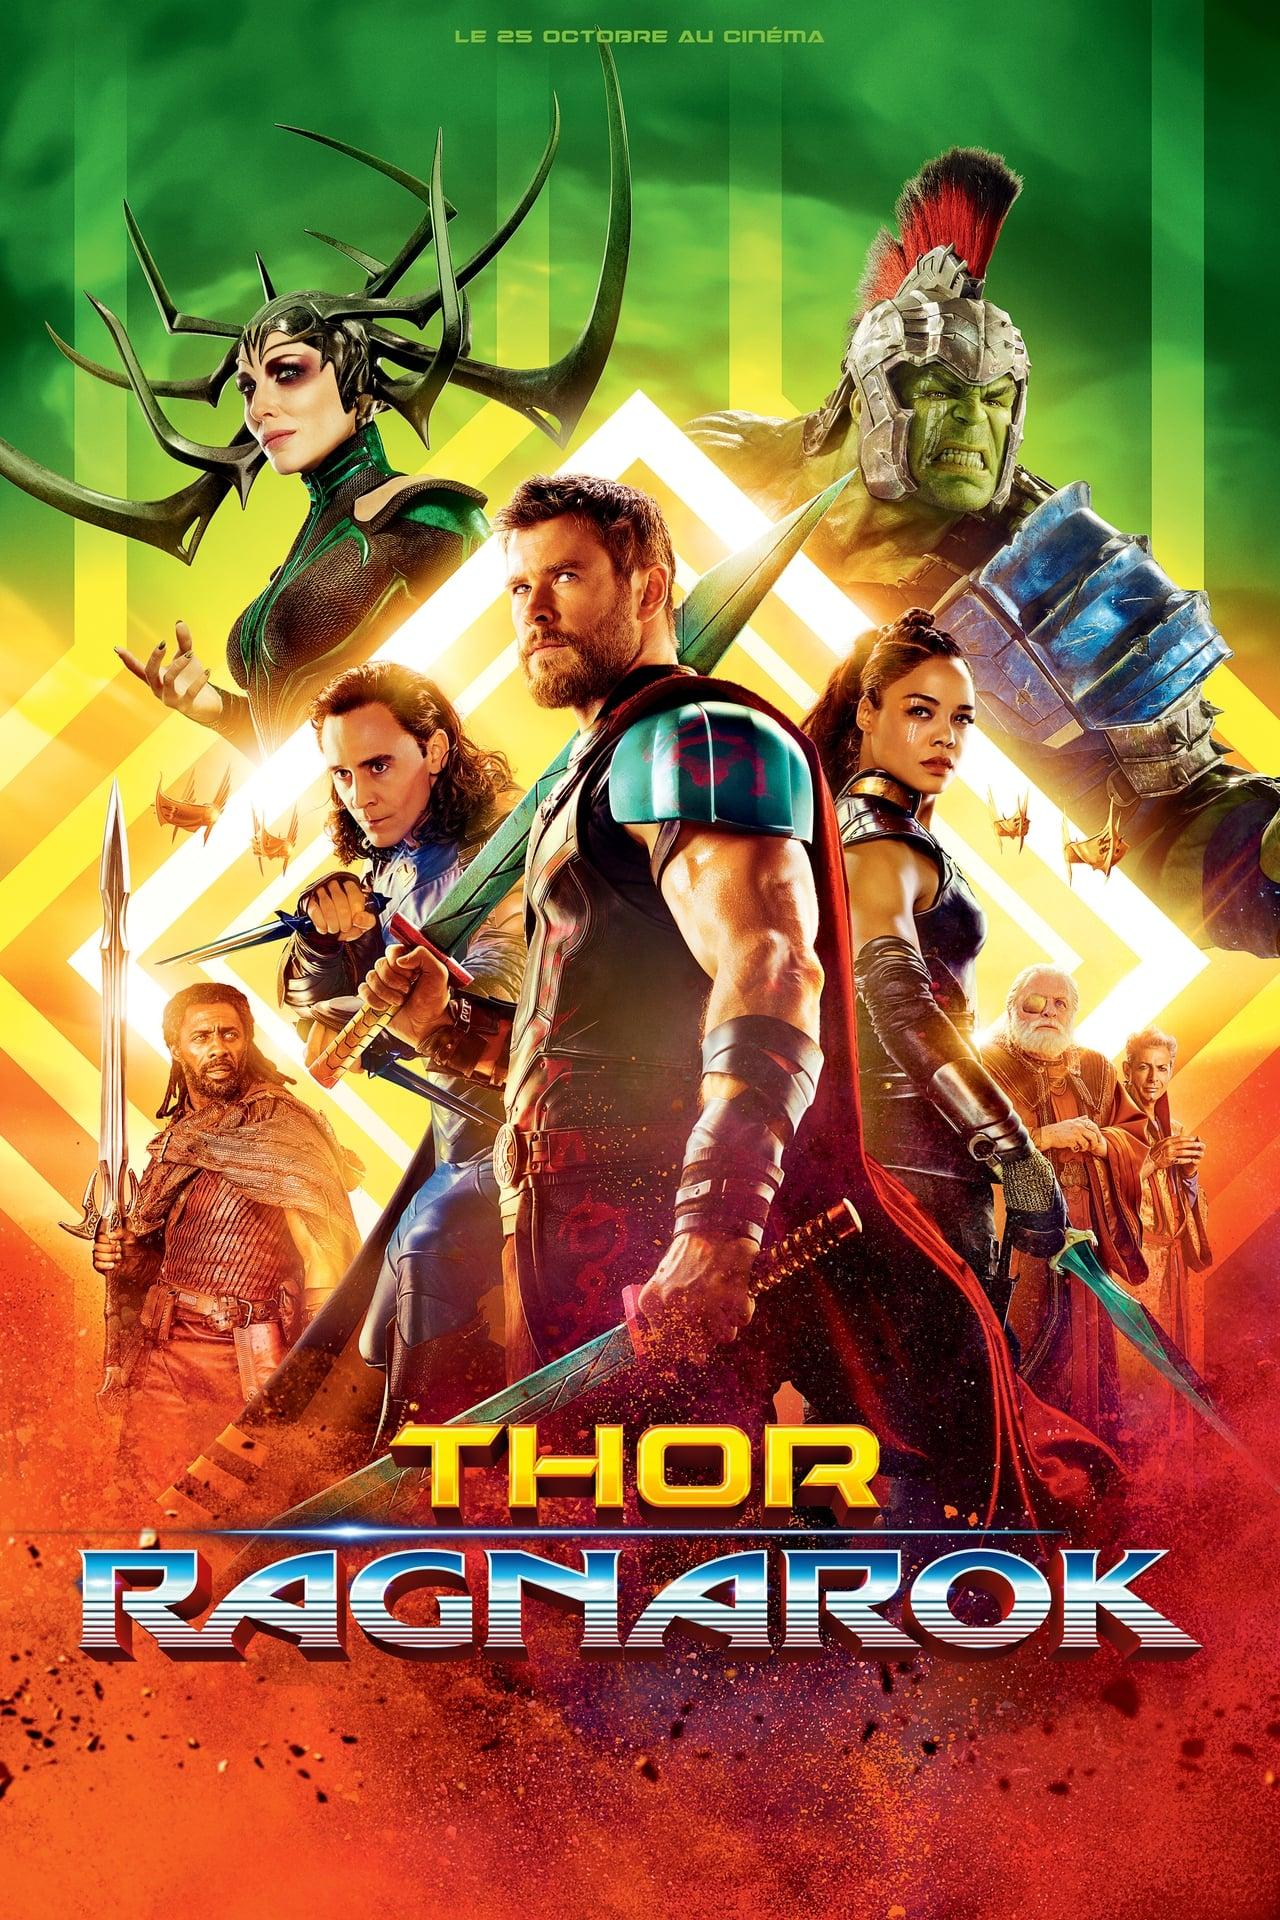 Thor Ragnarok English Subtitles : ragnarok, english, subtitles, Thor:, Ragnarok, Subtitles, English, Opensubtitles.com